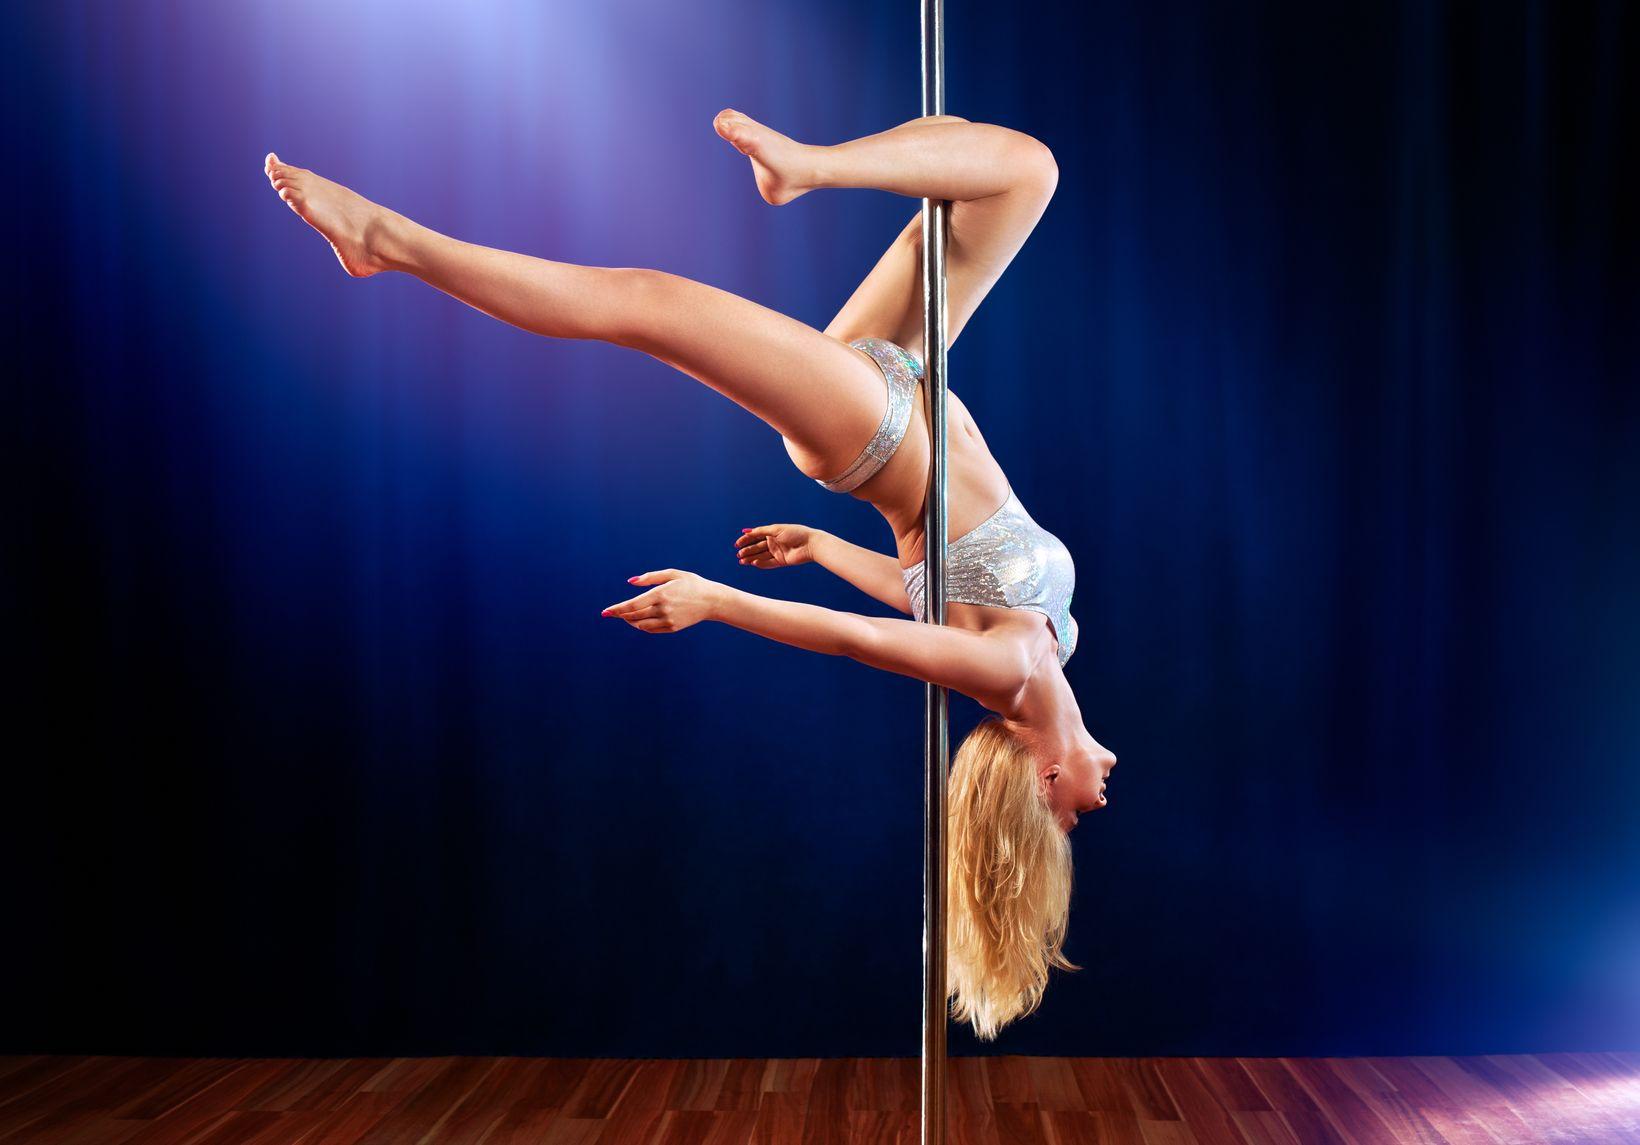 Hot pole dancing women, poze teen naked xxx